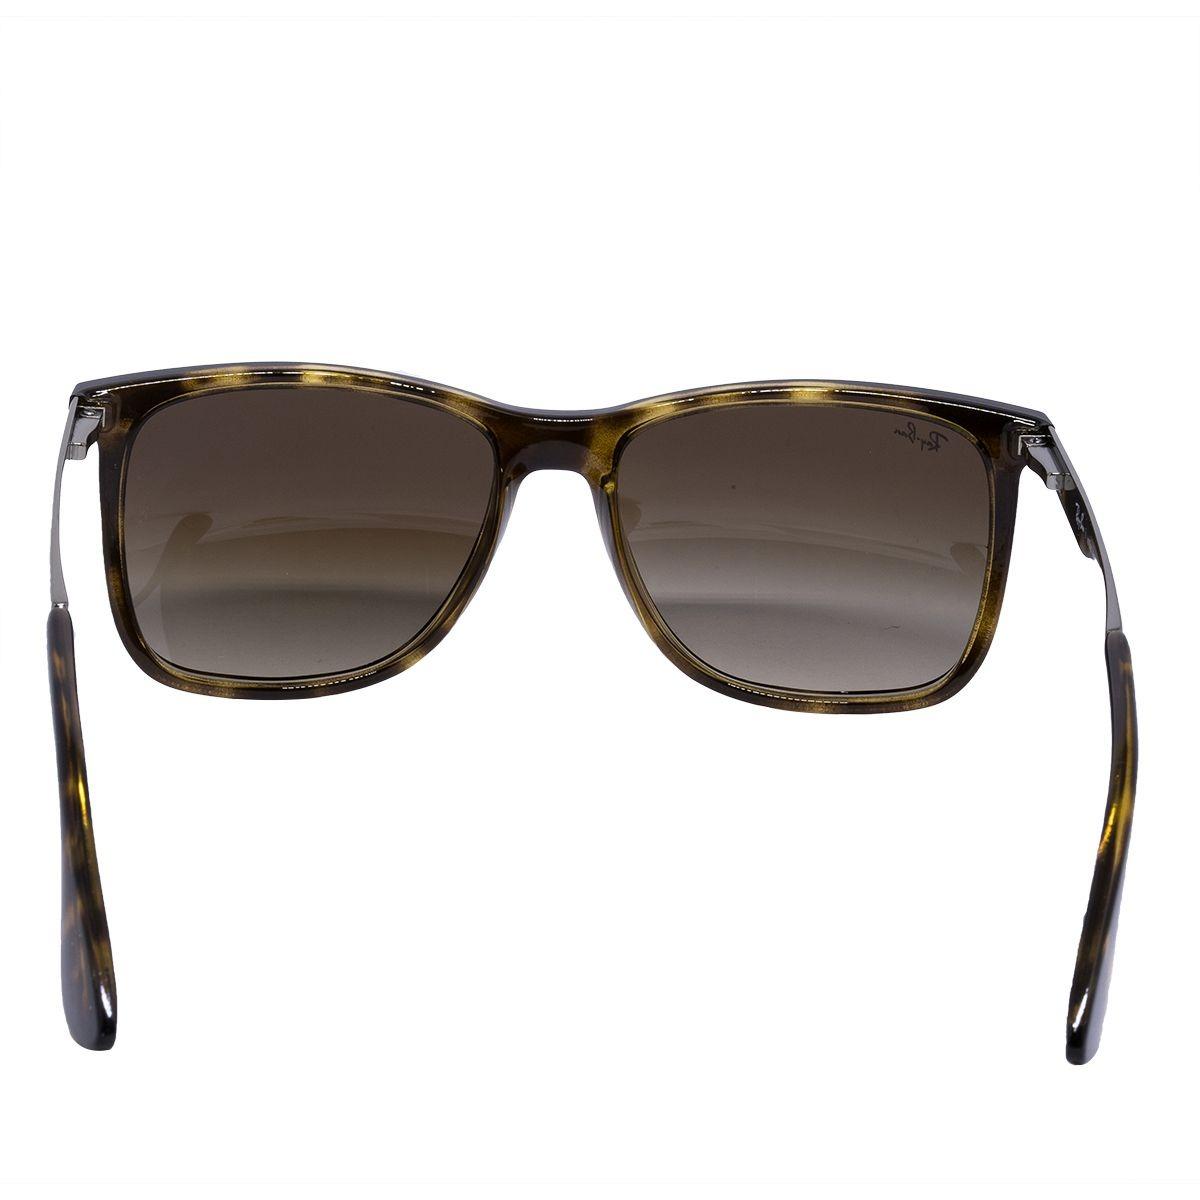 6add1cb83903d Óculos De Sol Ray Ban Original Glossy Havana Rb4271 - R  484